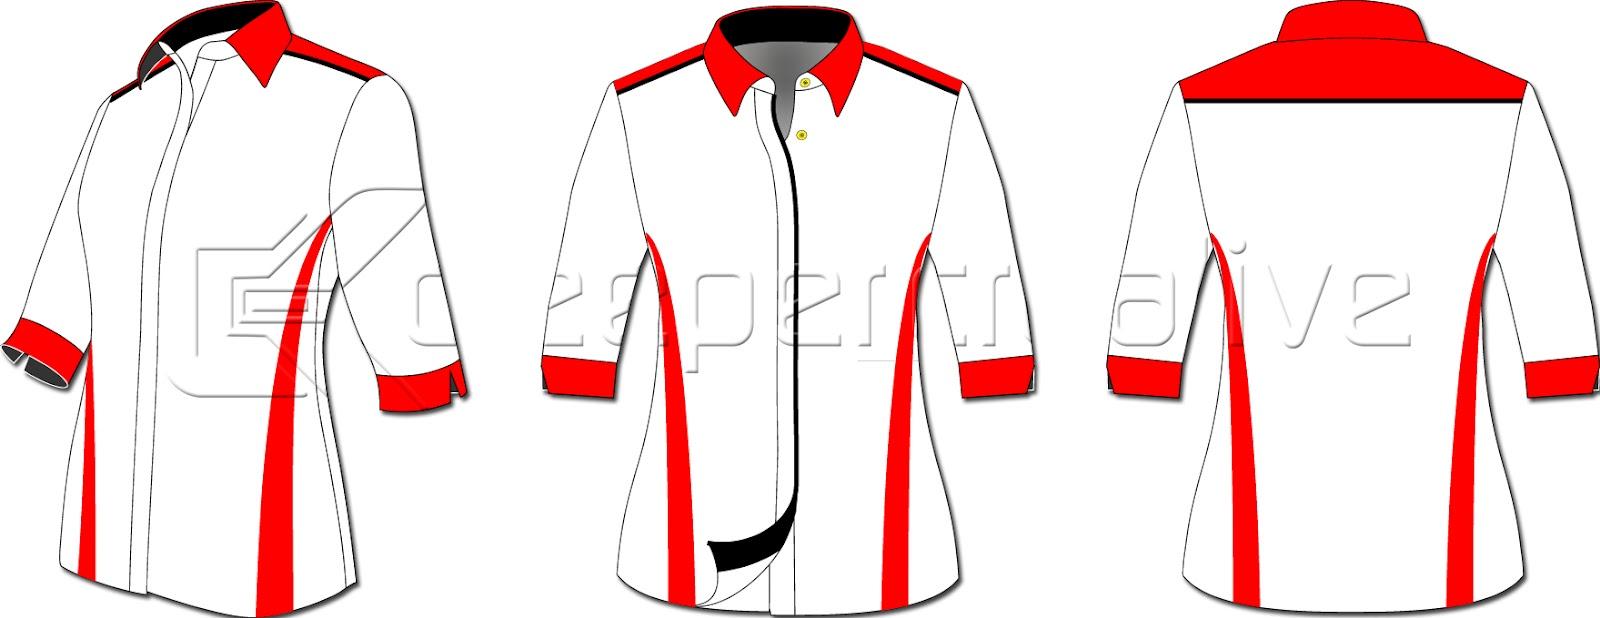 Uniform Design CS 03 Series | Corporate Shirts